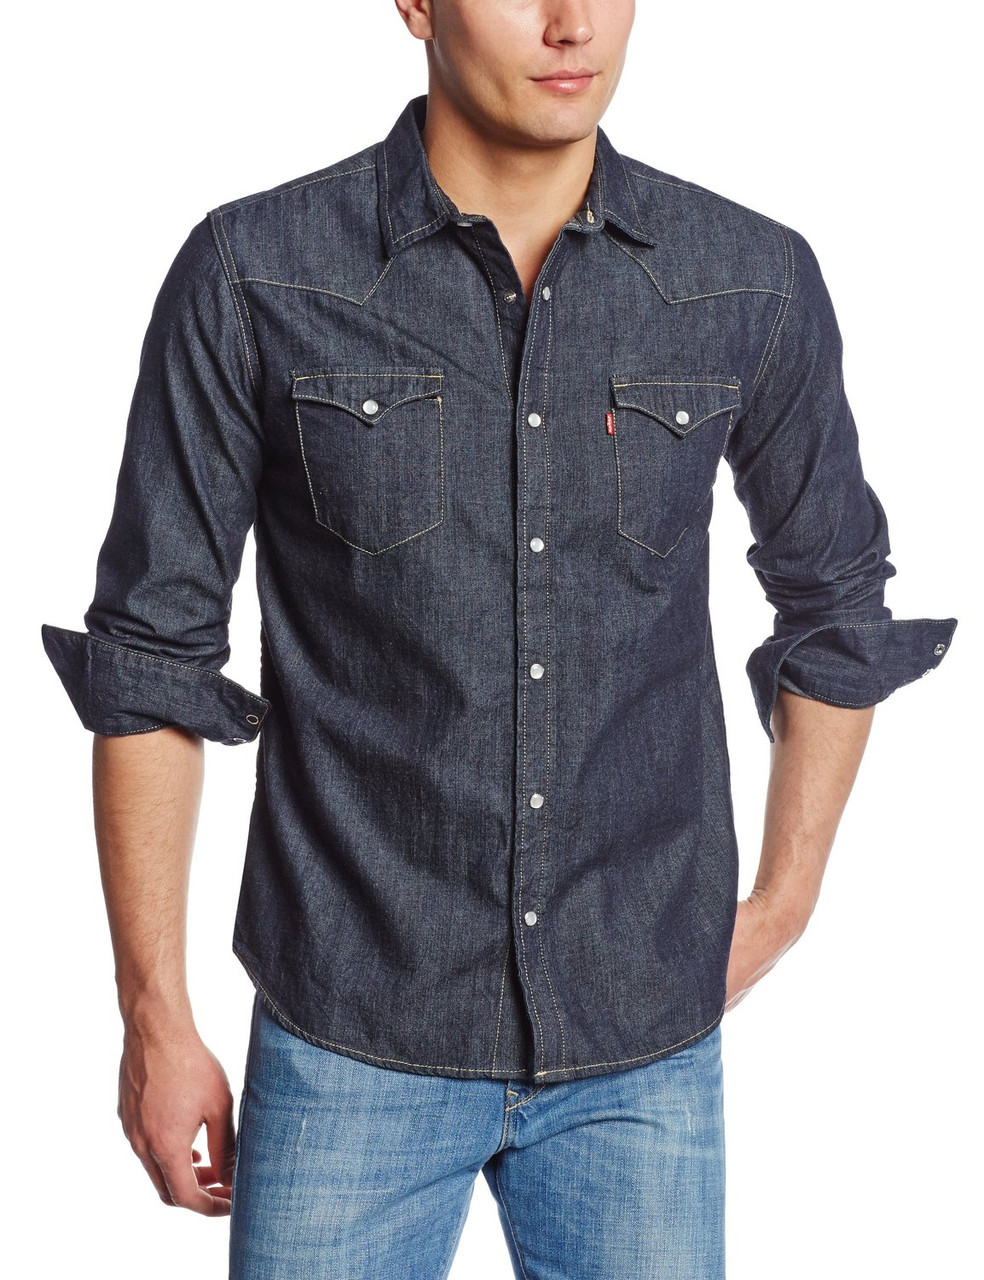 Рубашка джинсовая Levi's Men's Standard Barstow Denim Western Dark Rinse